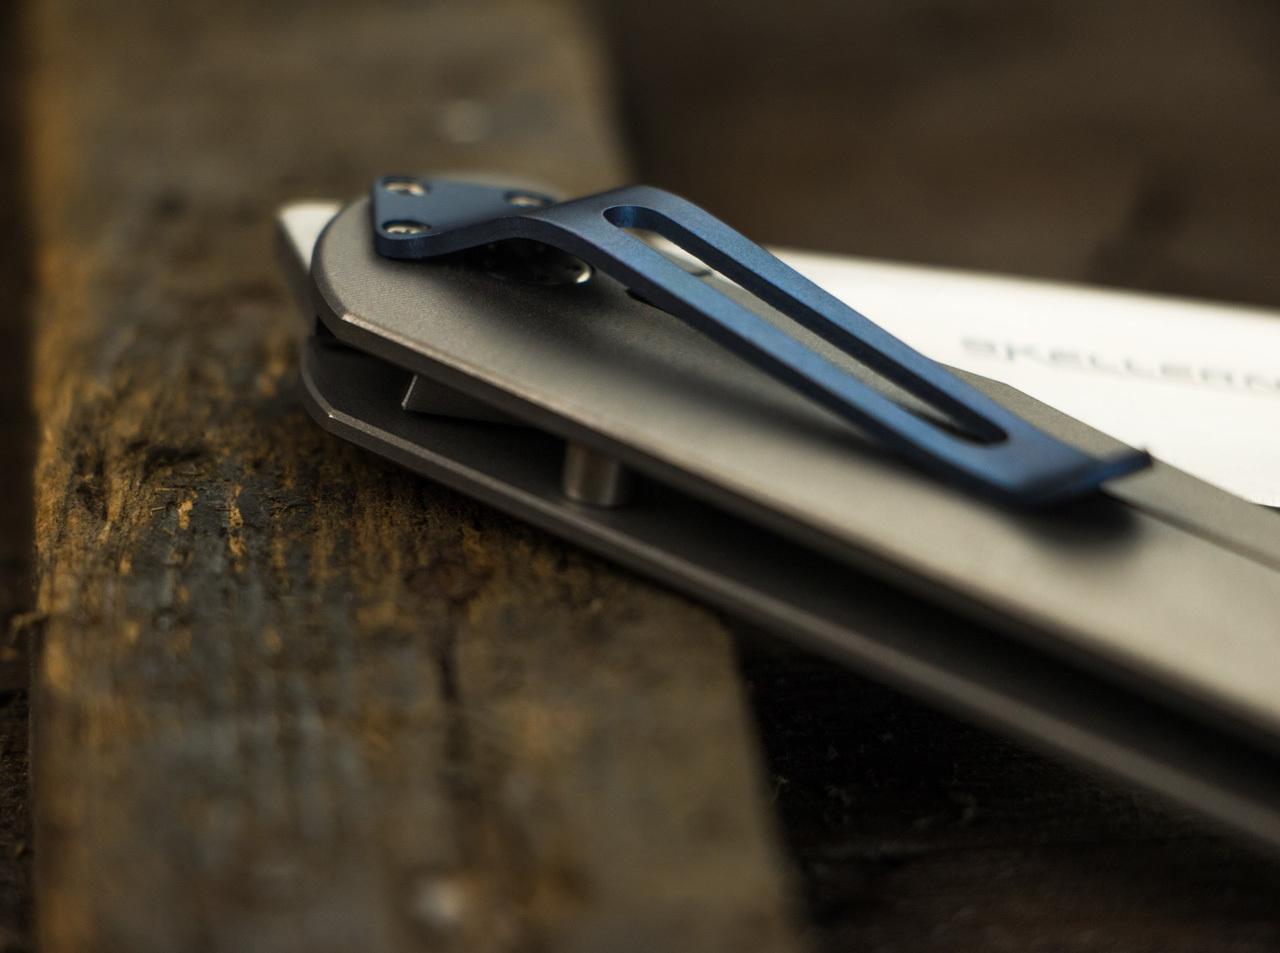 Фото 10 - Складной нож Exskelibur 1 Titanium, Boker Plus 01BO133, сталь CPM-S35VN Satin Plain, рукоять титан, серый